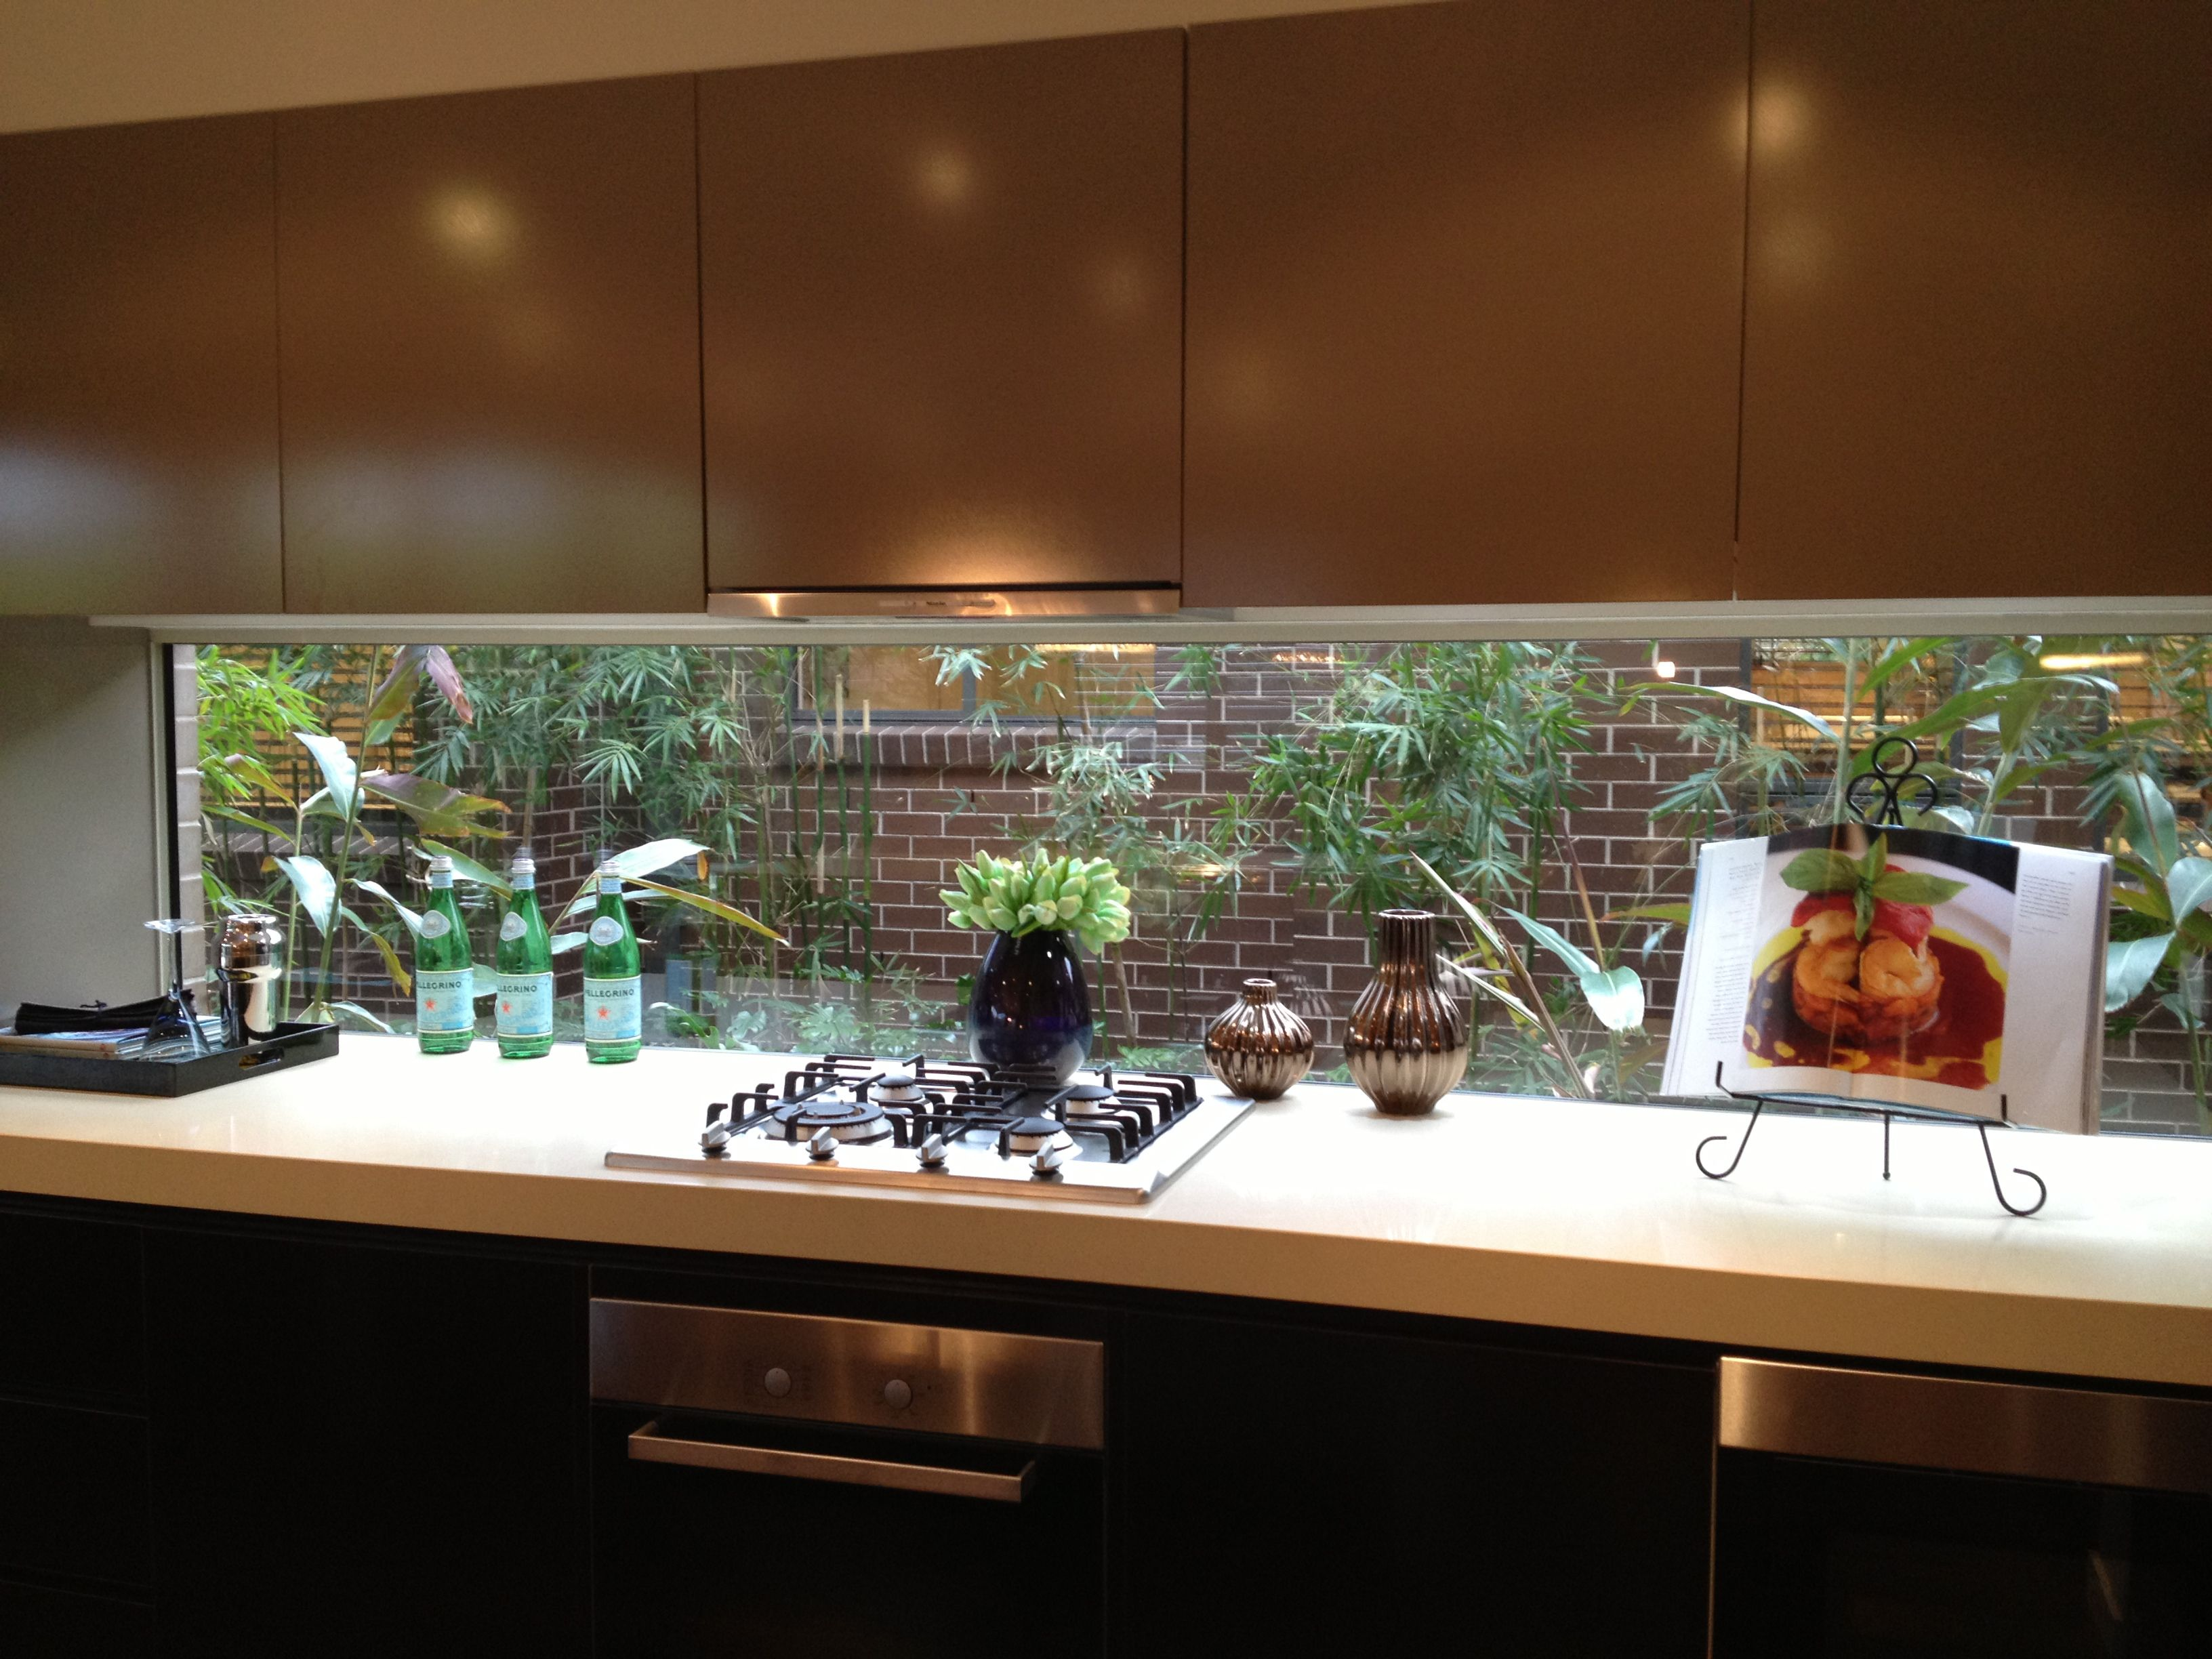 Window in The Kitchen Cheaper Than A Splashback Maybe Sunshine. Splashback Ideas For Kitchens. Kitchen Decor Kitchen Designs Kitchen Decorating Ideas Printed. Melbourne Skyline Featured On This Vr Art Glass Splashback By